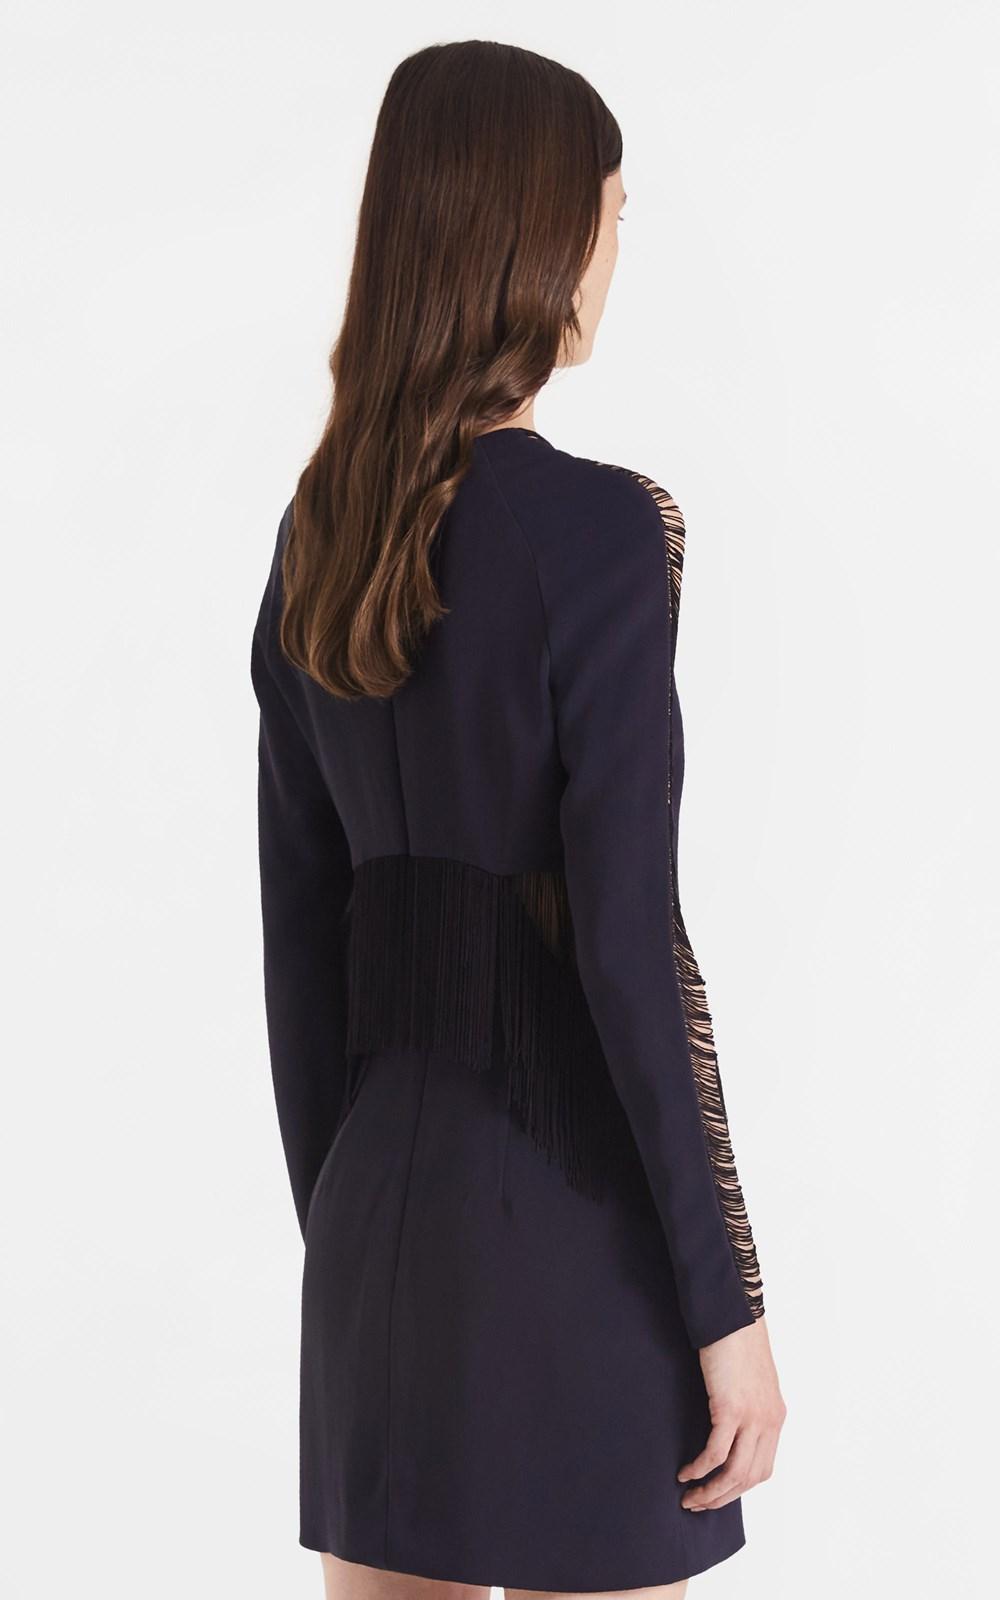 Dresses | FRINGE LOOP MINI DRESS